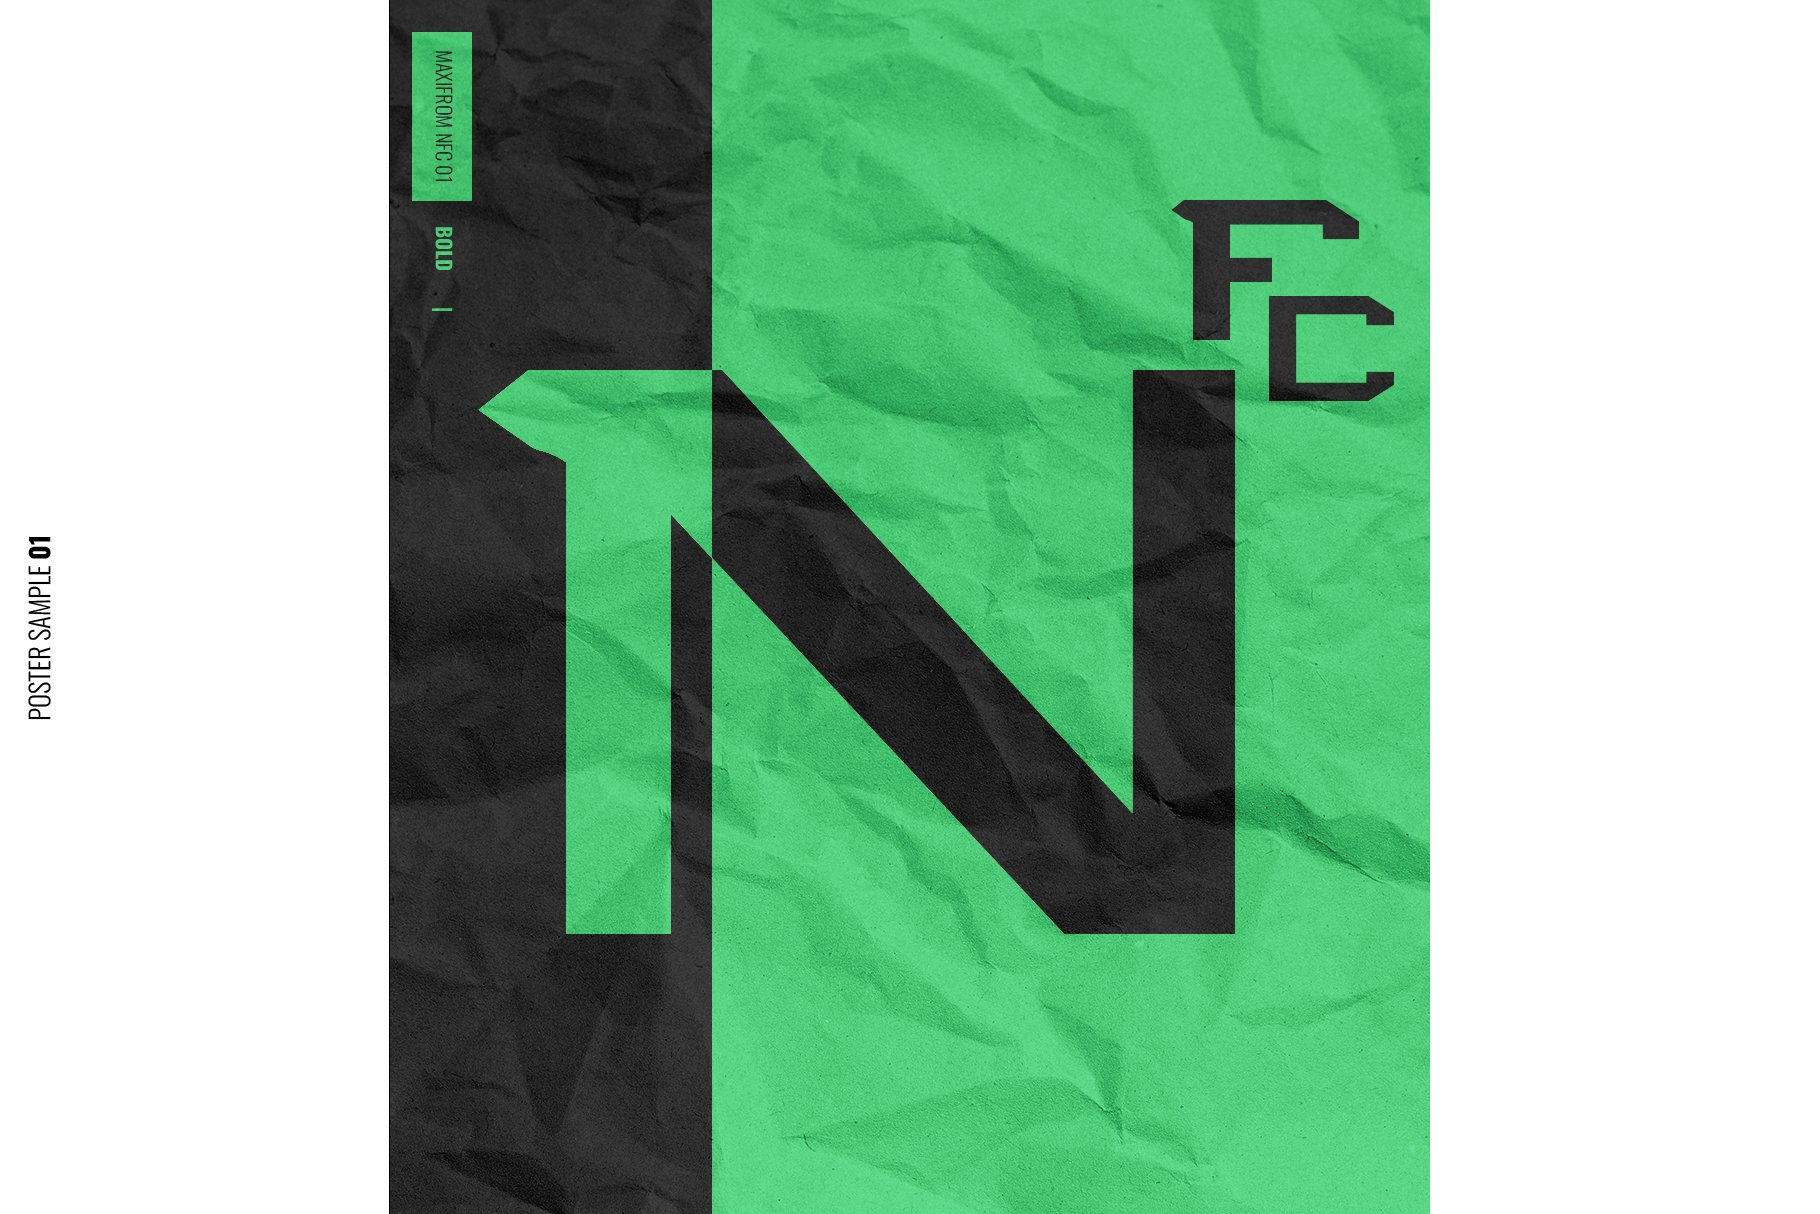 NFC MAXIMORF DISPLAY FONT example image 4